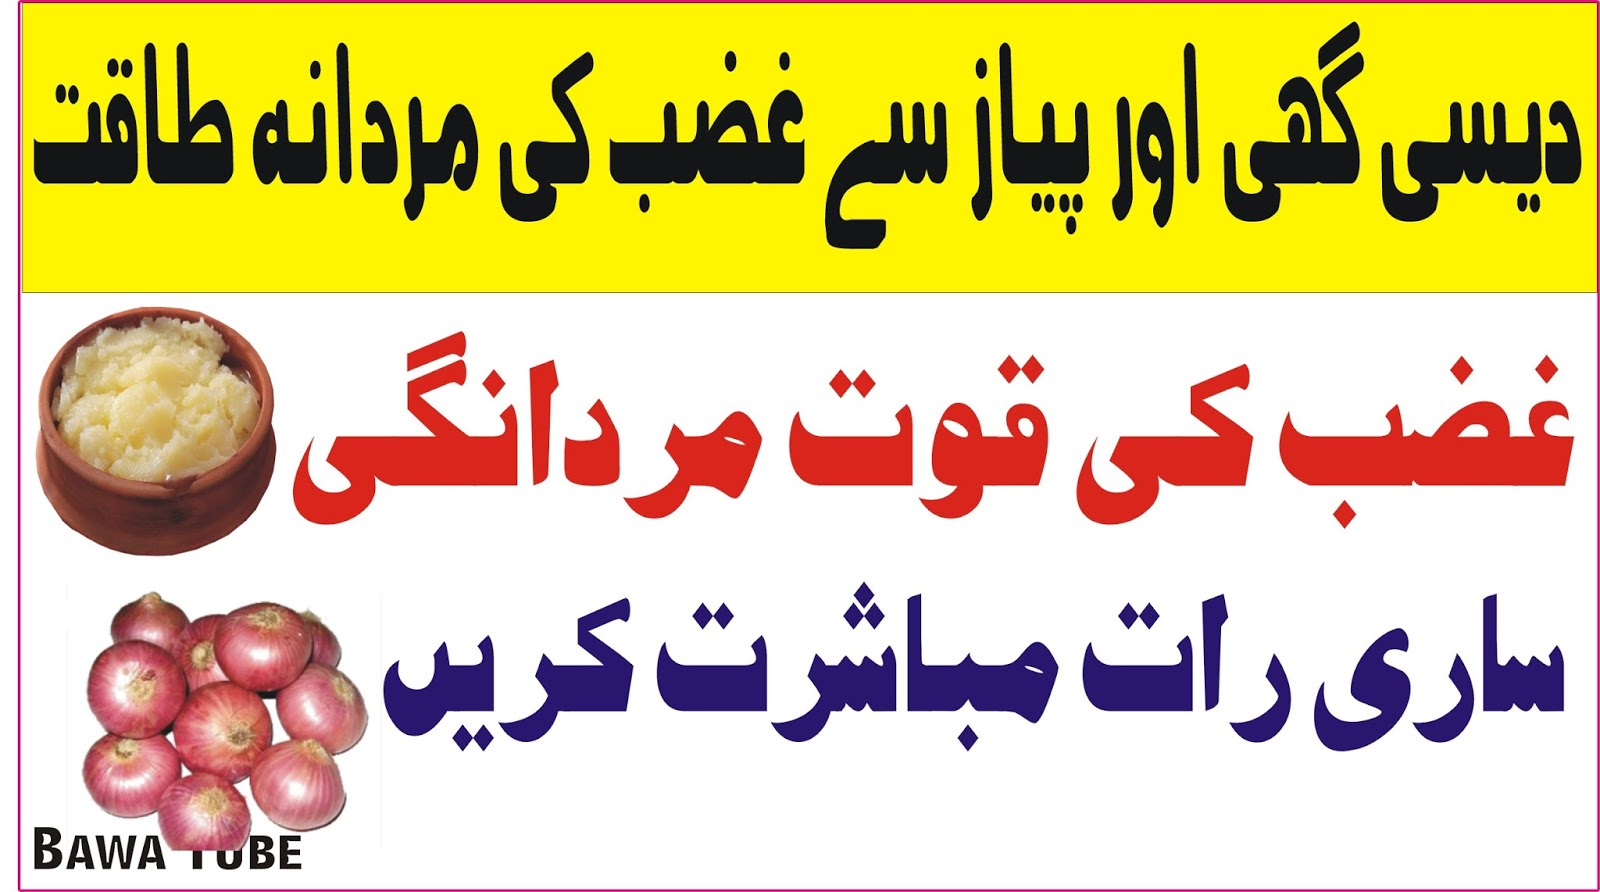 Desi Ghee Aur Pyaz Se Mardana Taqat - Jismani Taqat Aur -5979